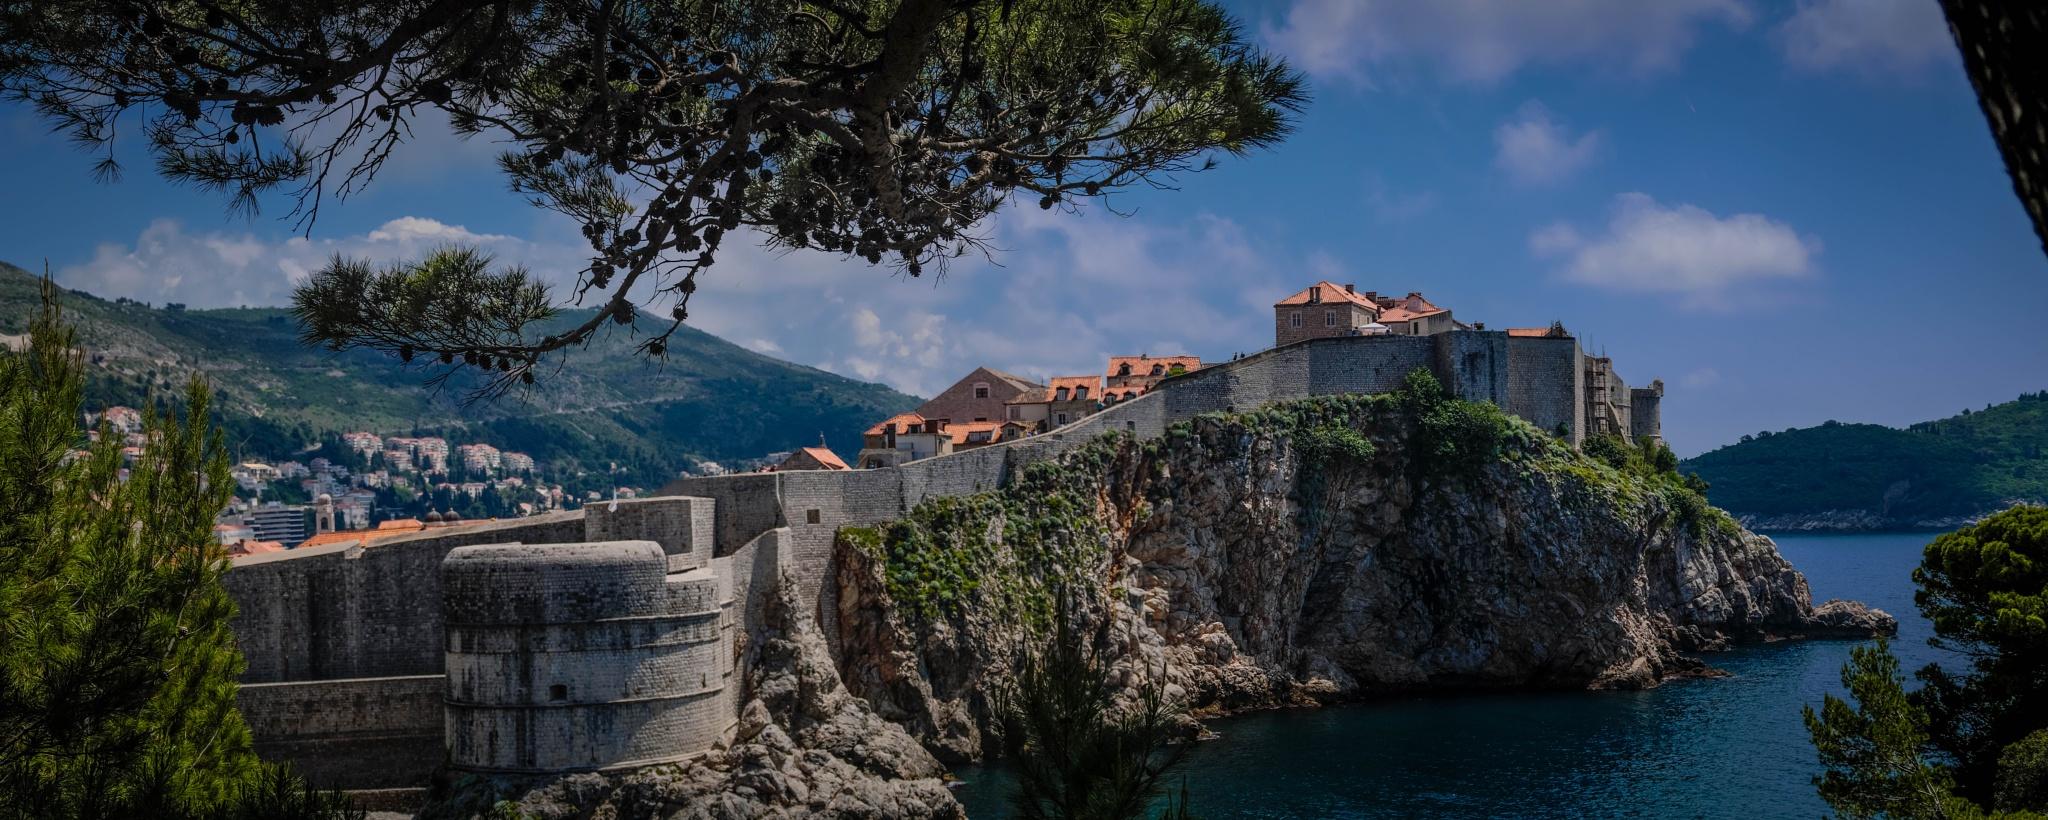 Photo in Cityscape #dubrovnik #croatia #panorama #sunshine #sea #coast #defences #city #architecture #travel #europe #balkans